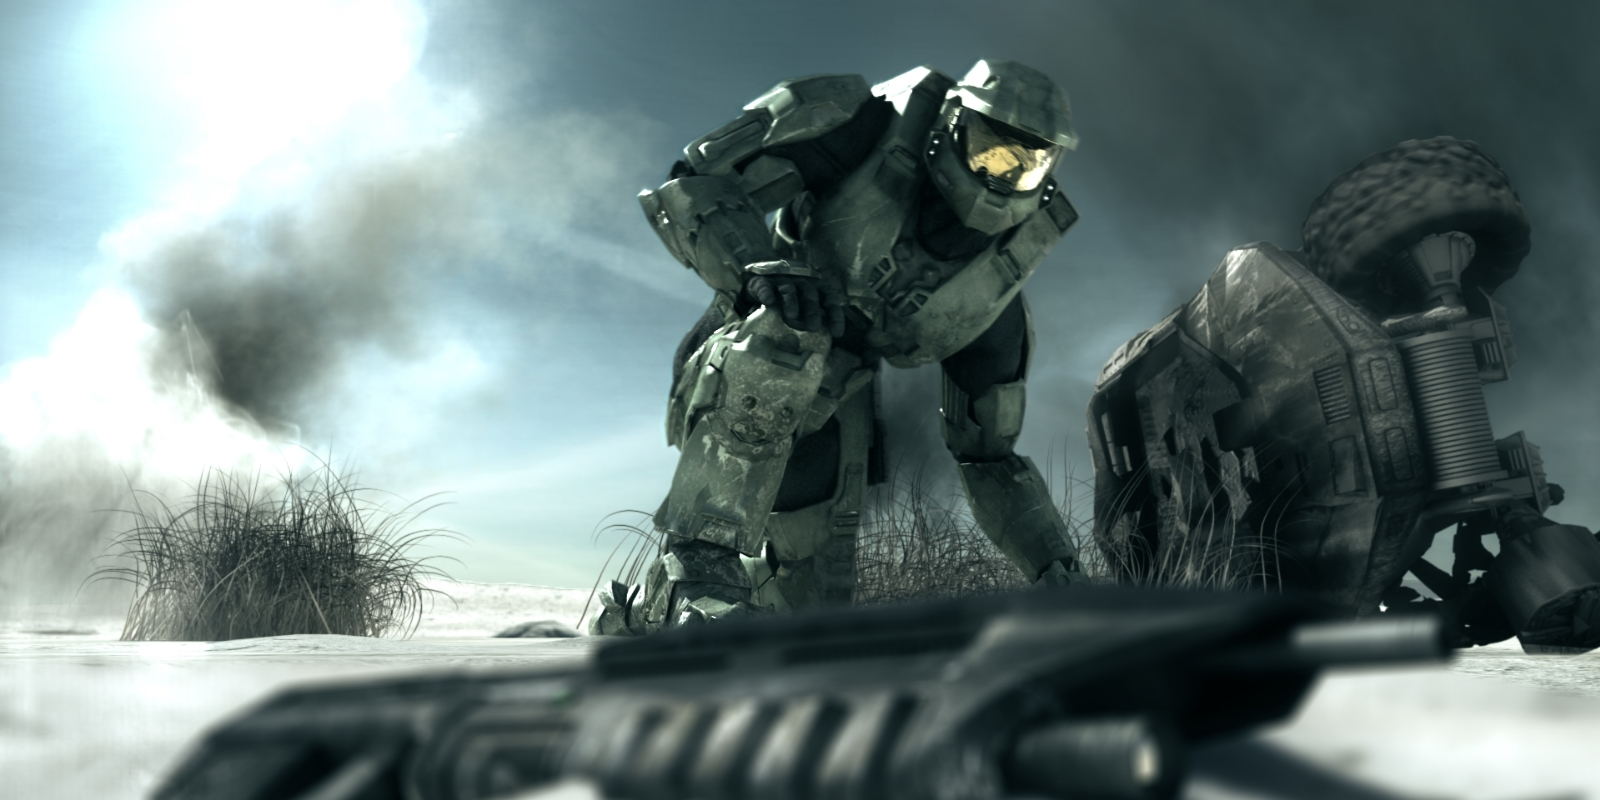 District 9's Neill Blomkamp wants to work on Halo - MSPoweruser